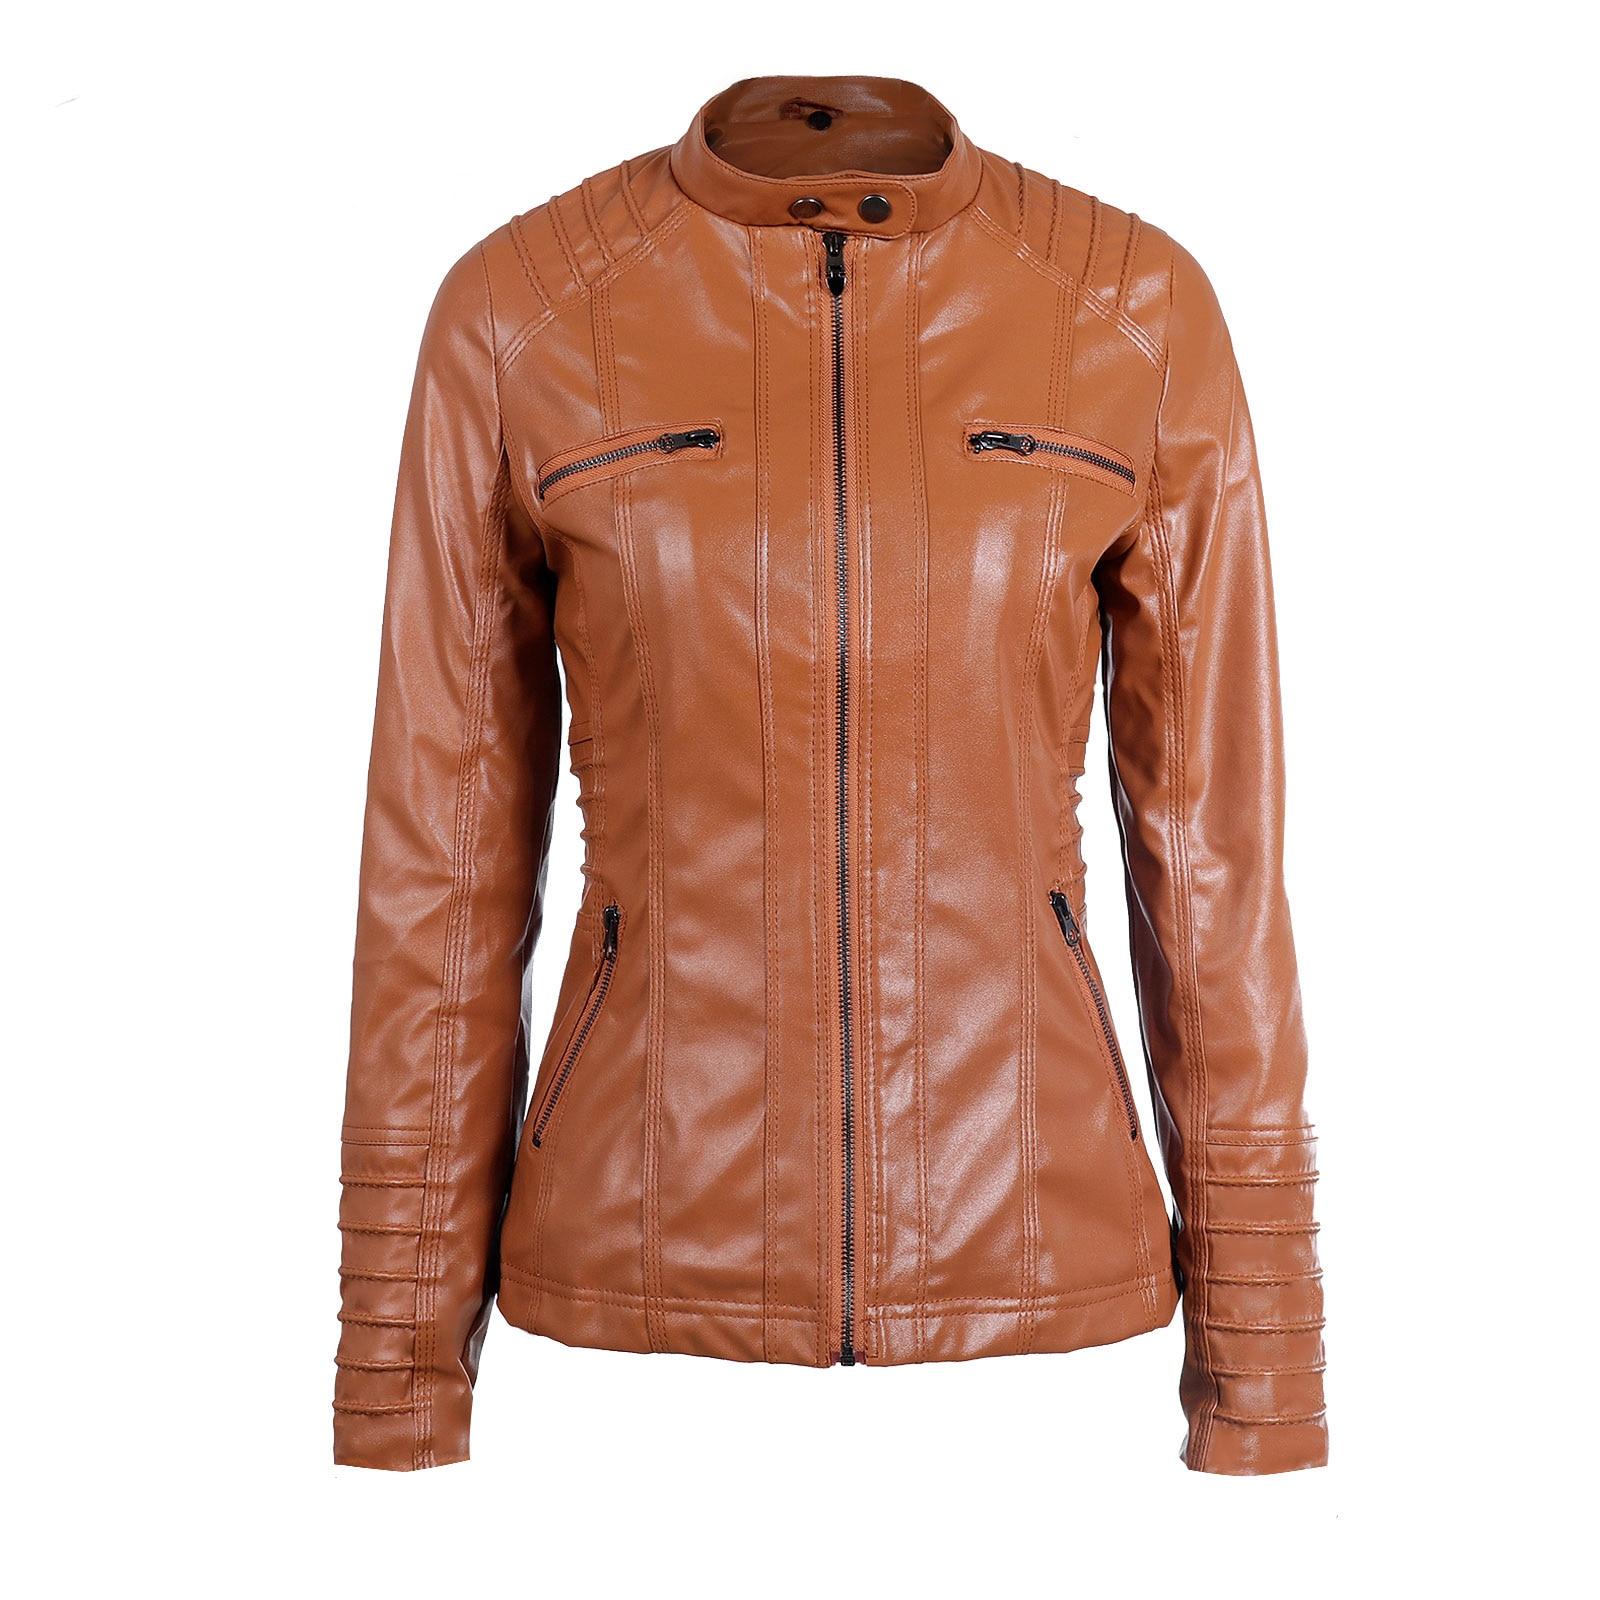 Riverdale Southside Riverdale Serpents black Brown PU Leather Jacket Women Riverdale Serpents Streetwear Leather Brand Coat 8